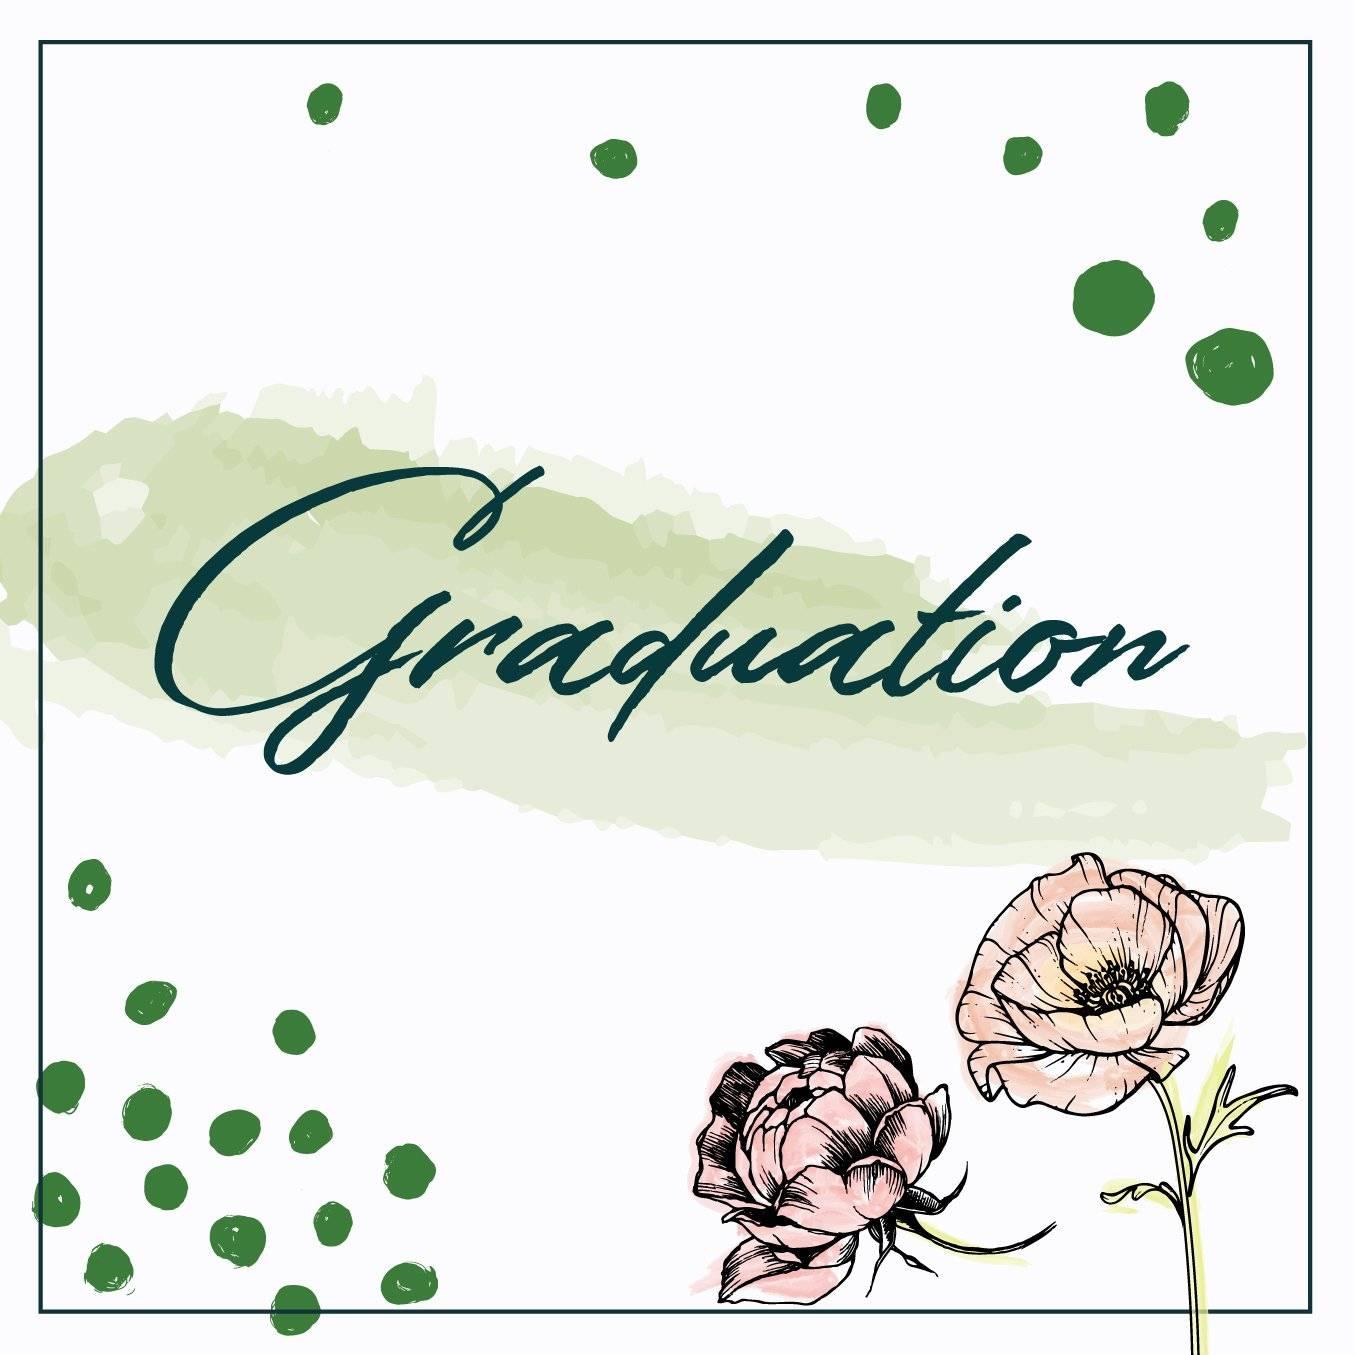 Graduation flower Delivery | Graduation flowers